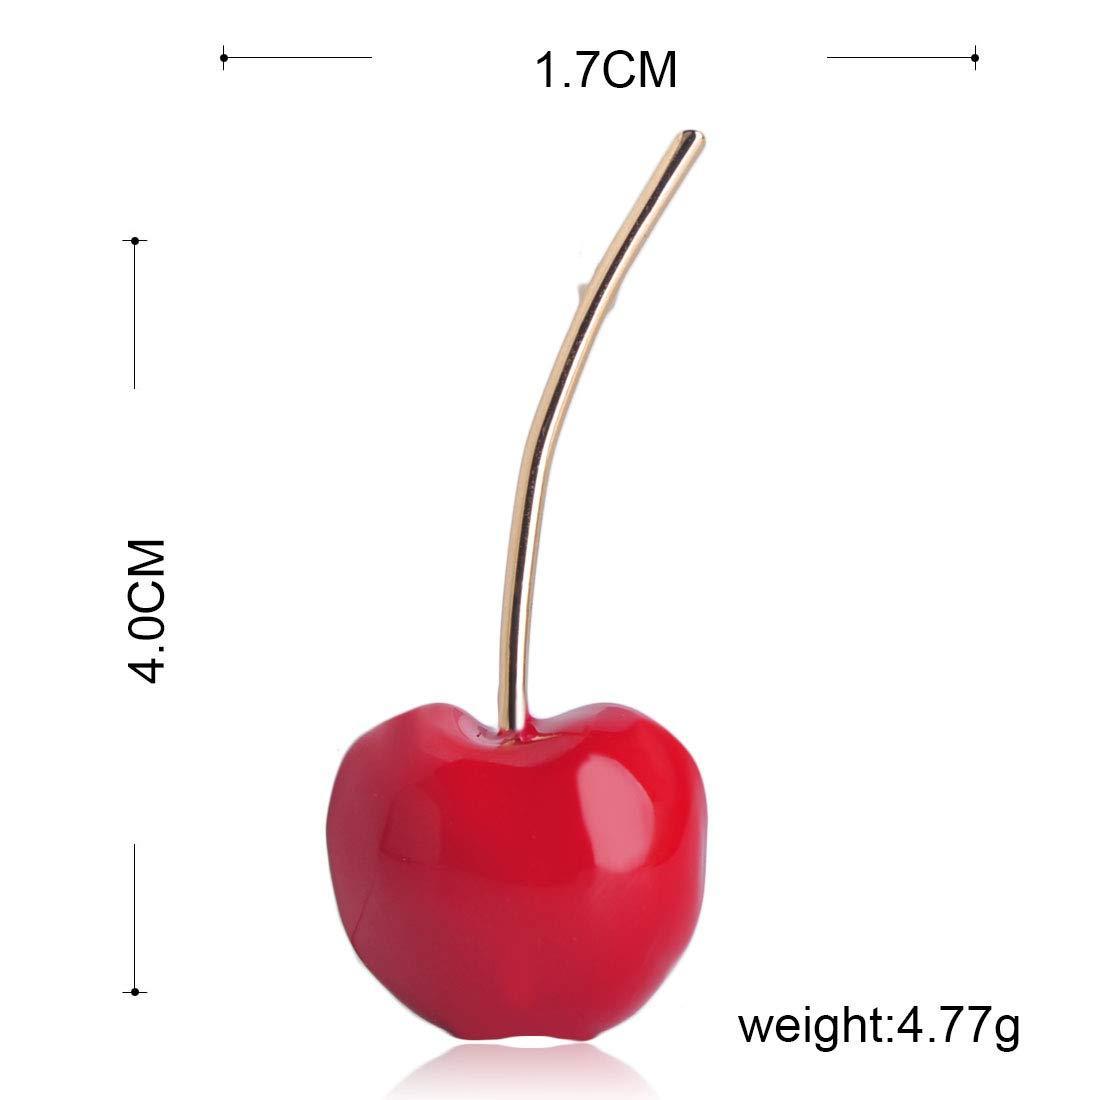 MECHOSE Lovely Red Cherry Shape Brooch Pins for Women Kid Cute Small Enamel Fruit Sweater Shirt Bag by MECHOSEN (Image #3)